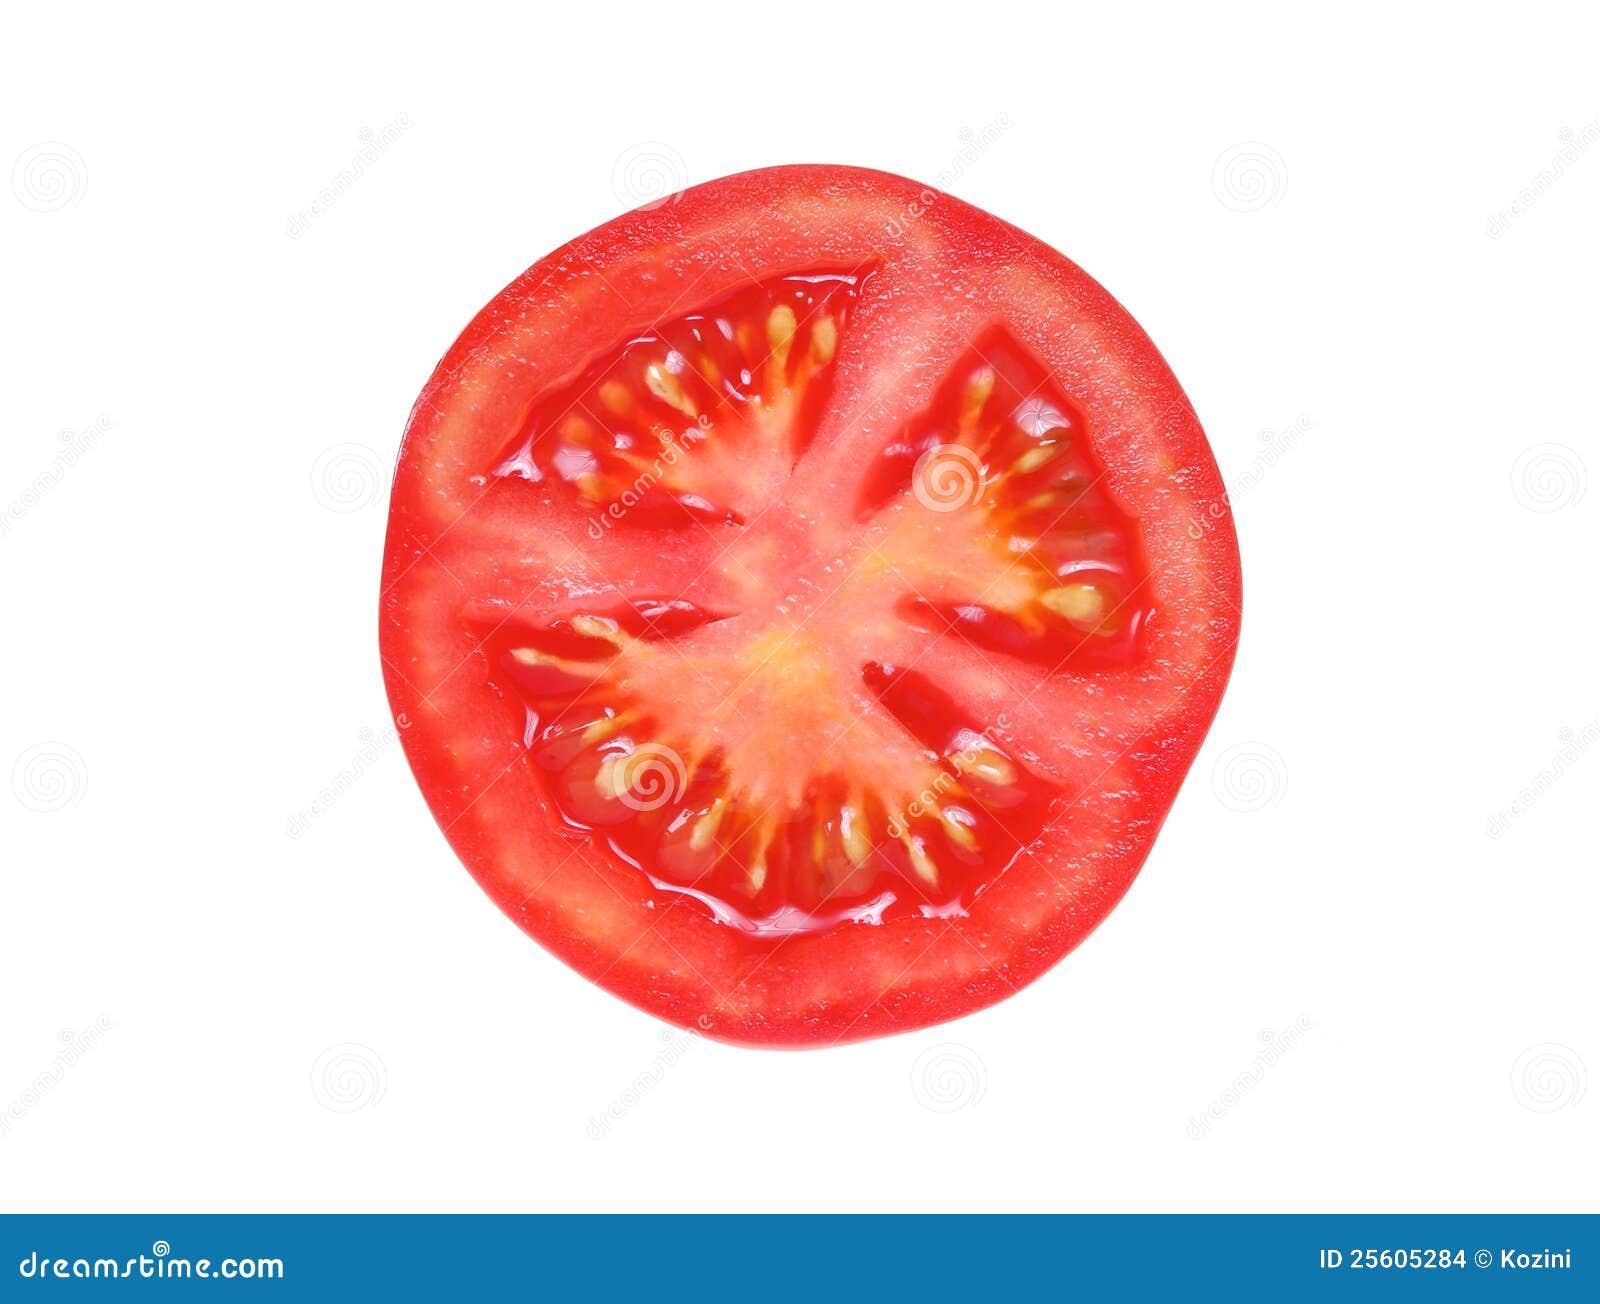 Green Tomato Fruit Cake